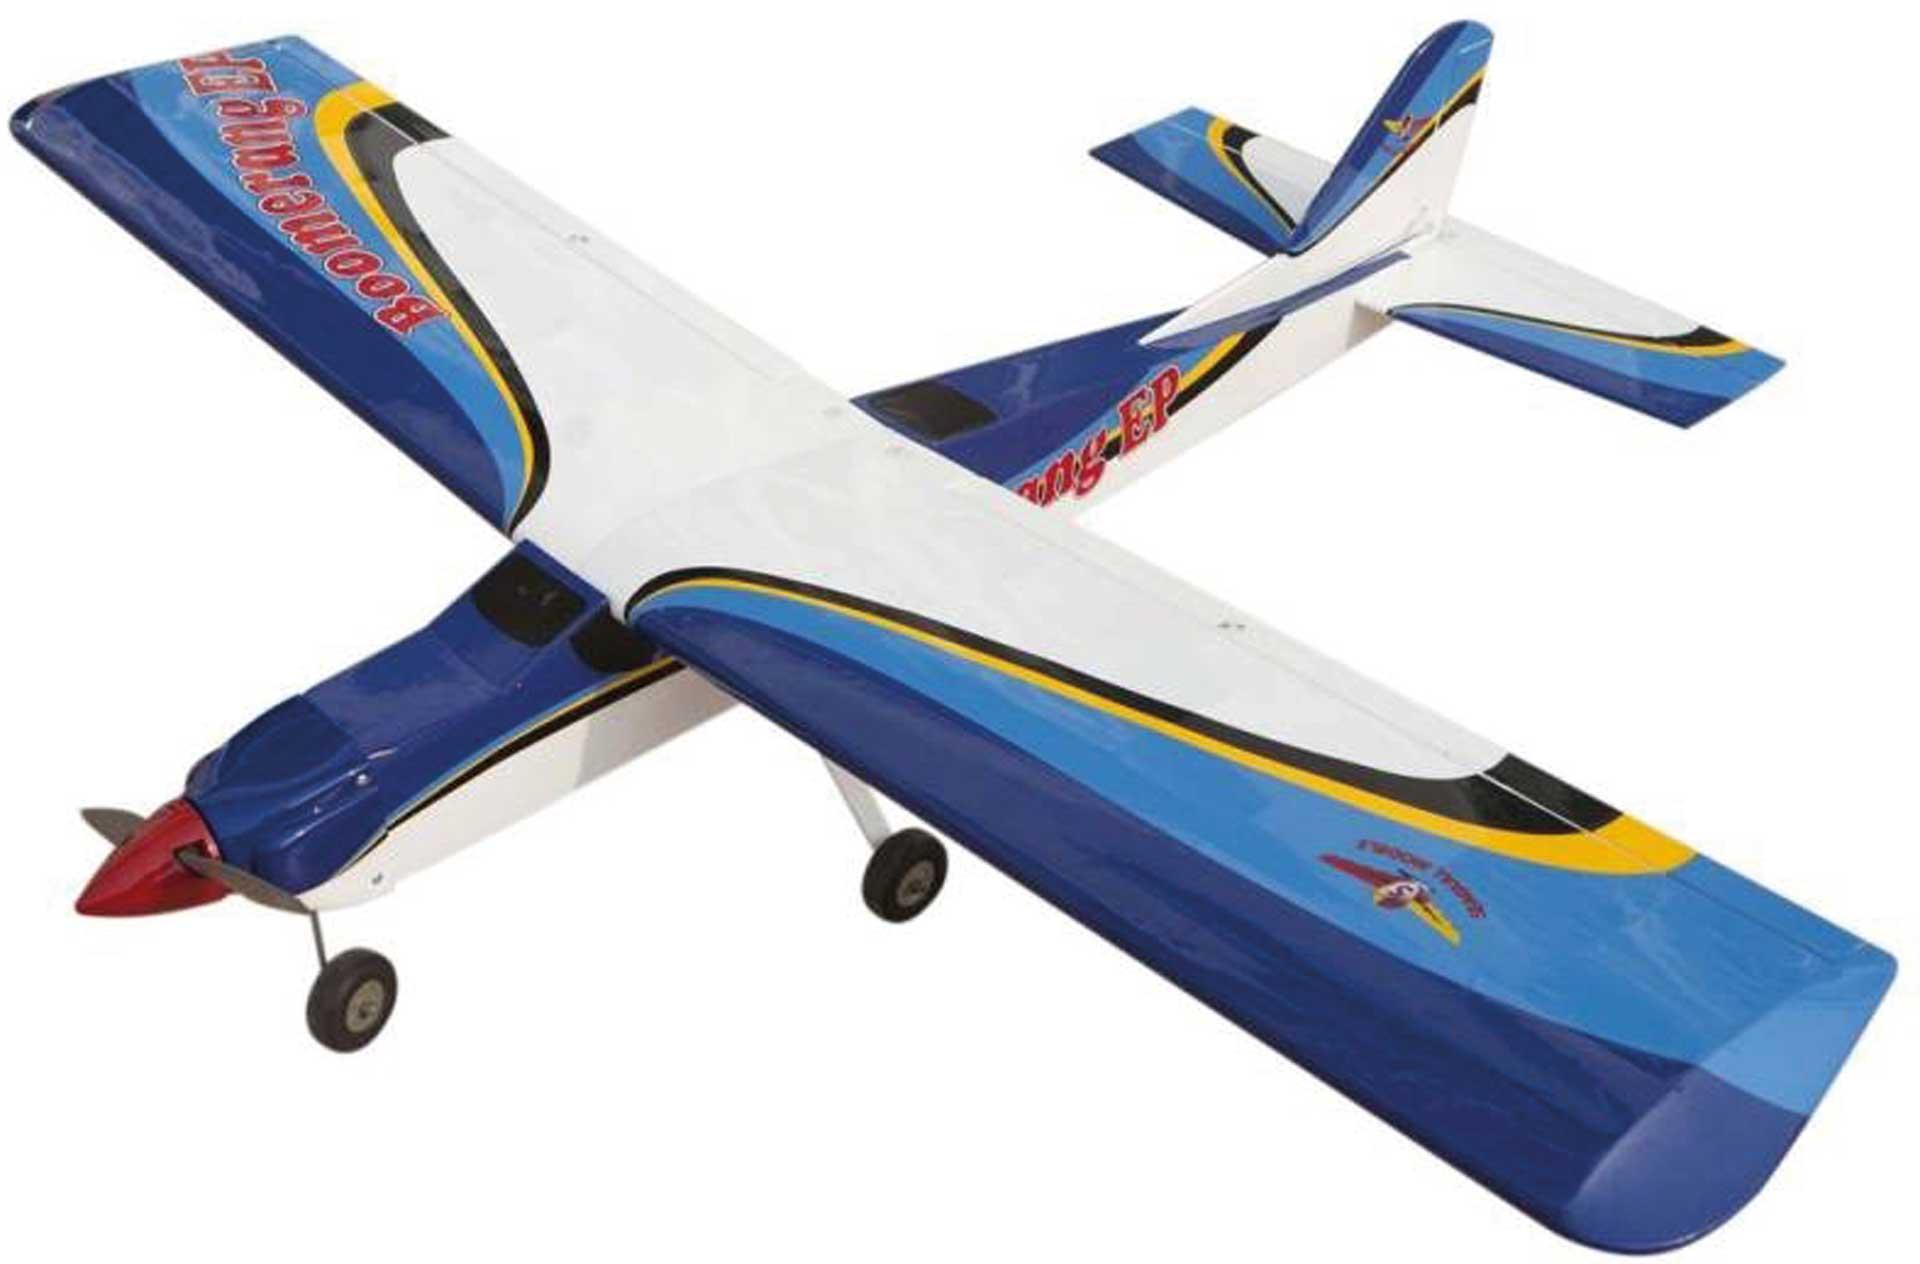 Seagull Models ( SG-Models ) Boomerang EP ARF Trainer